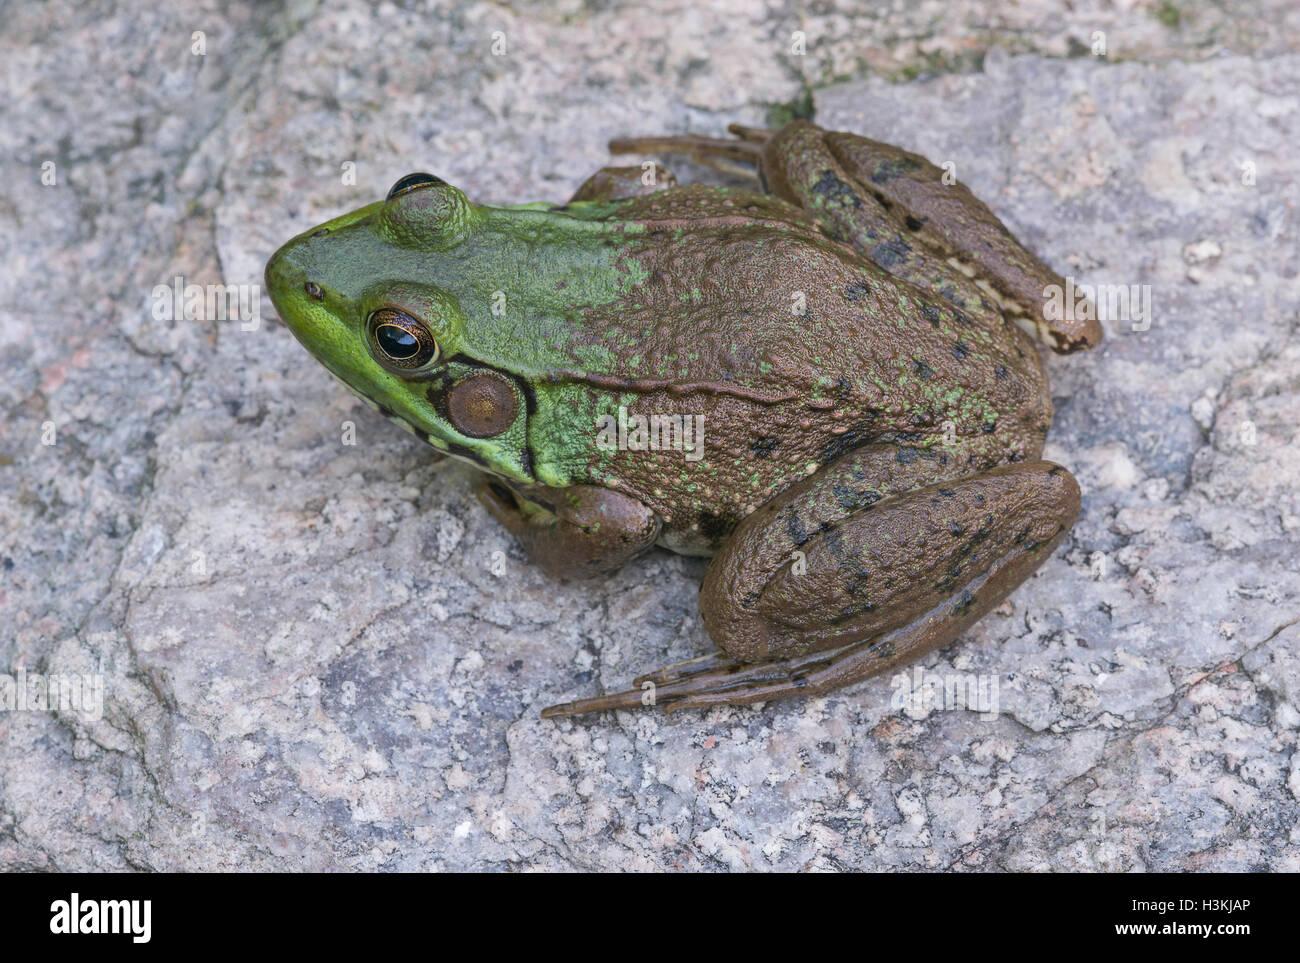 Green Frog Rana clamitans sitting on rock  Eastern USA - Stock Image